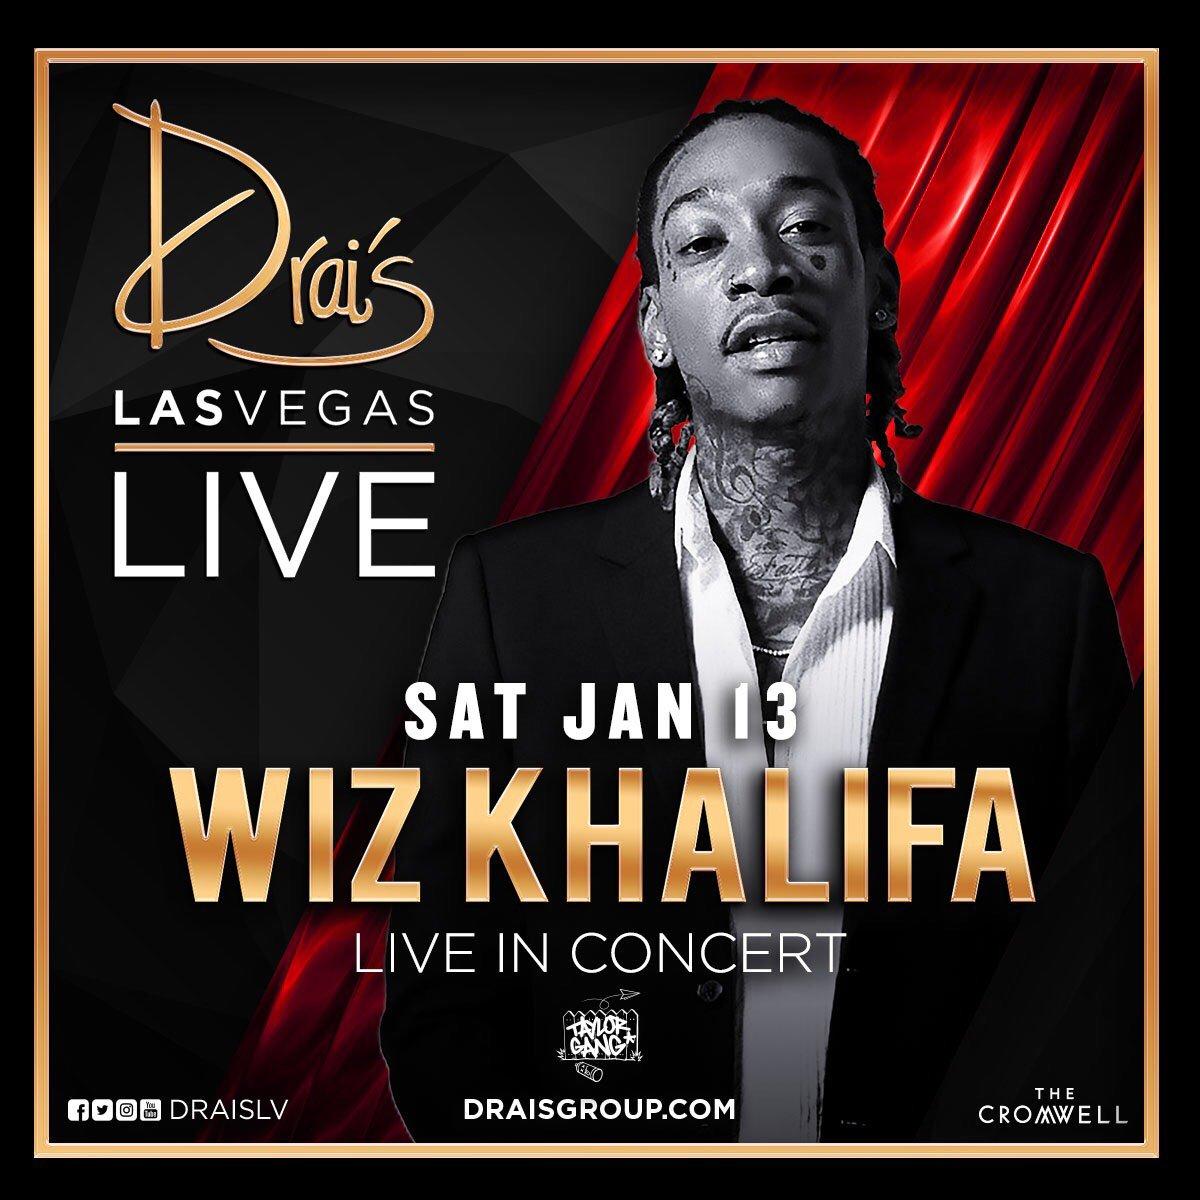 Saturday in Vegas. https://t.co/of7EAJuHg0 https://t.co/vWerX8wmSd